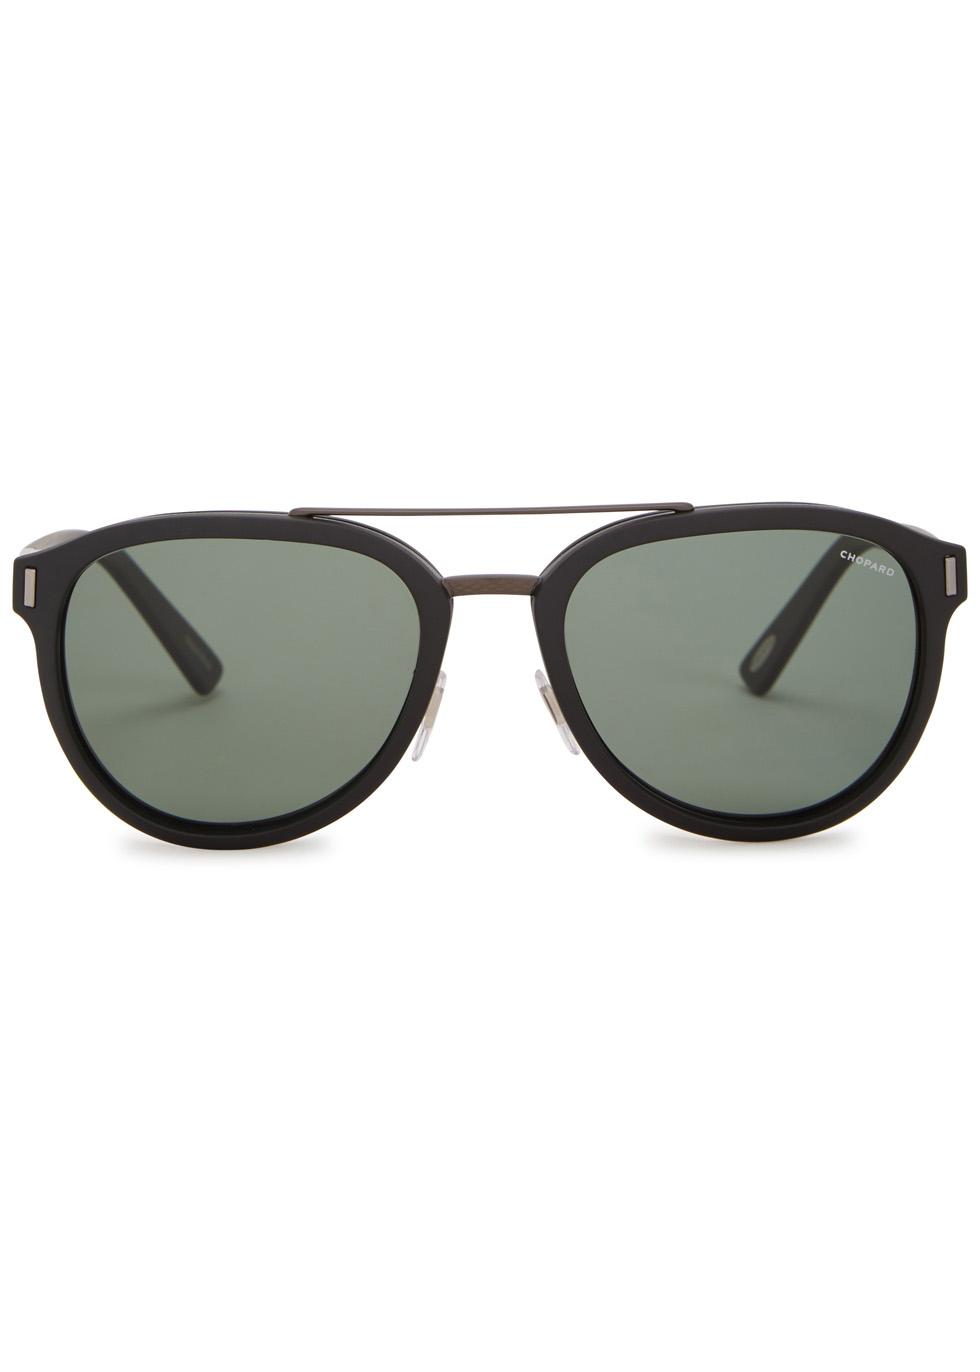 Matte black polarised aviator-style sunglasses - Chopard